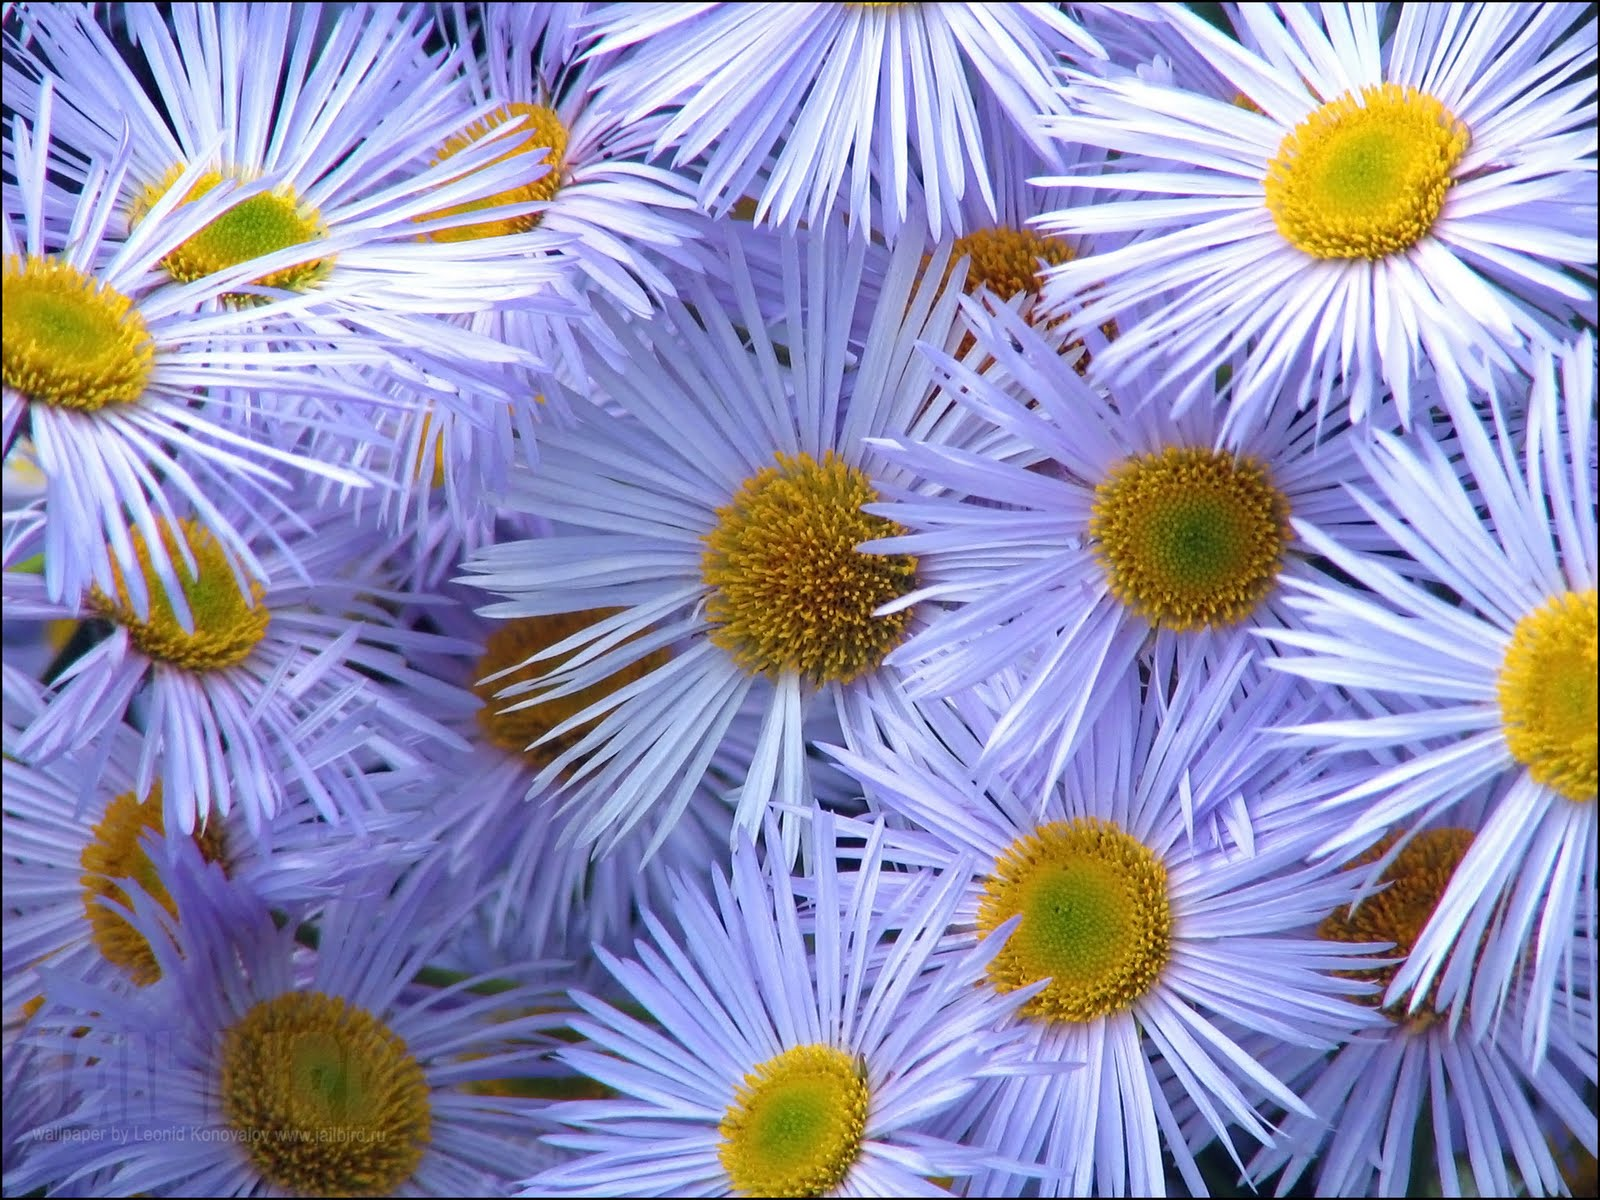 Desktop Wallpaper Desktop Wallpaper Flowers 1600x1200